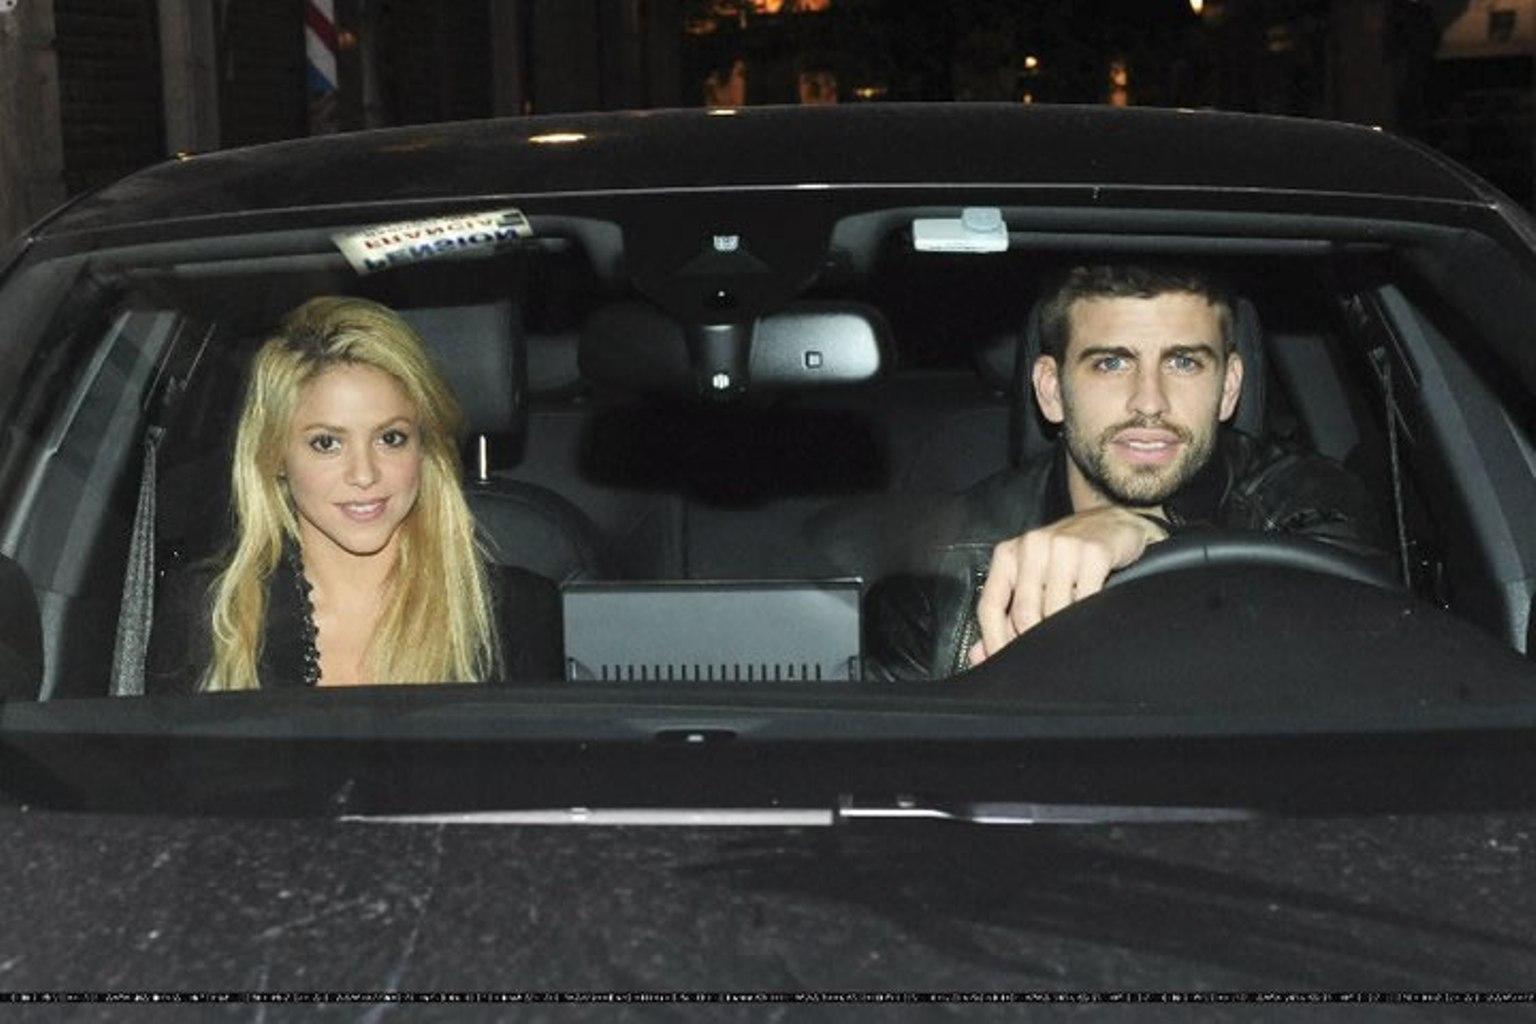 Shakira and Pique. - Page 2 Gerard-Piqu-Shakira-and-brother-gerard-pique-19520954-1536-1024